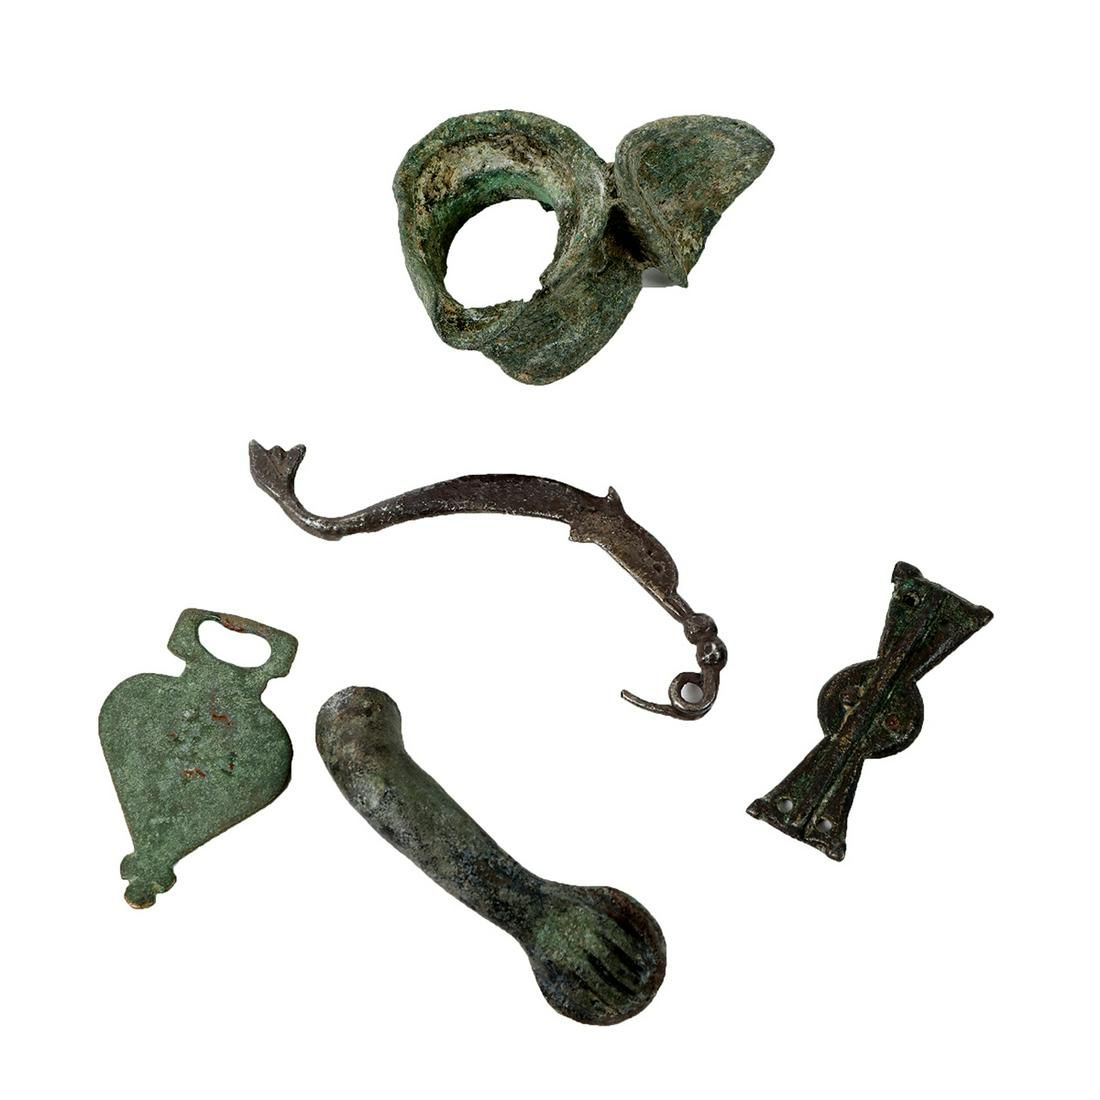 Lot of 5 Ancient Roman Bronze Ornaments c.1st-4th